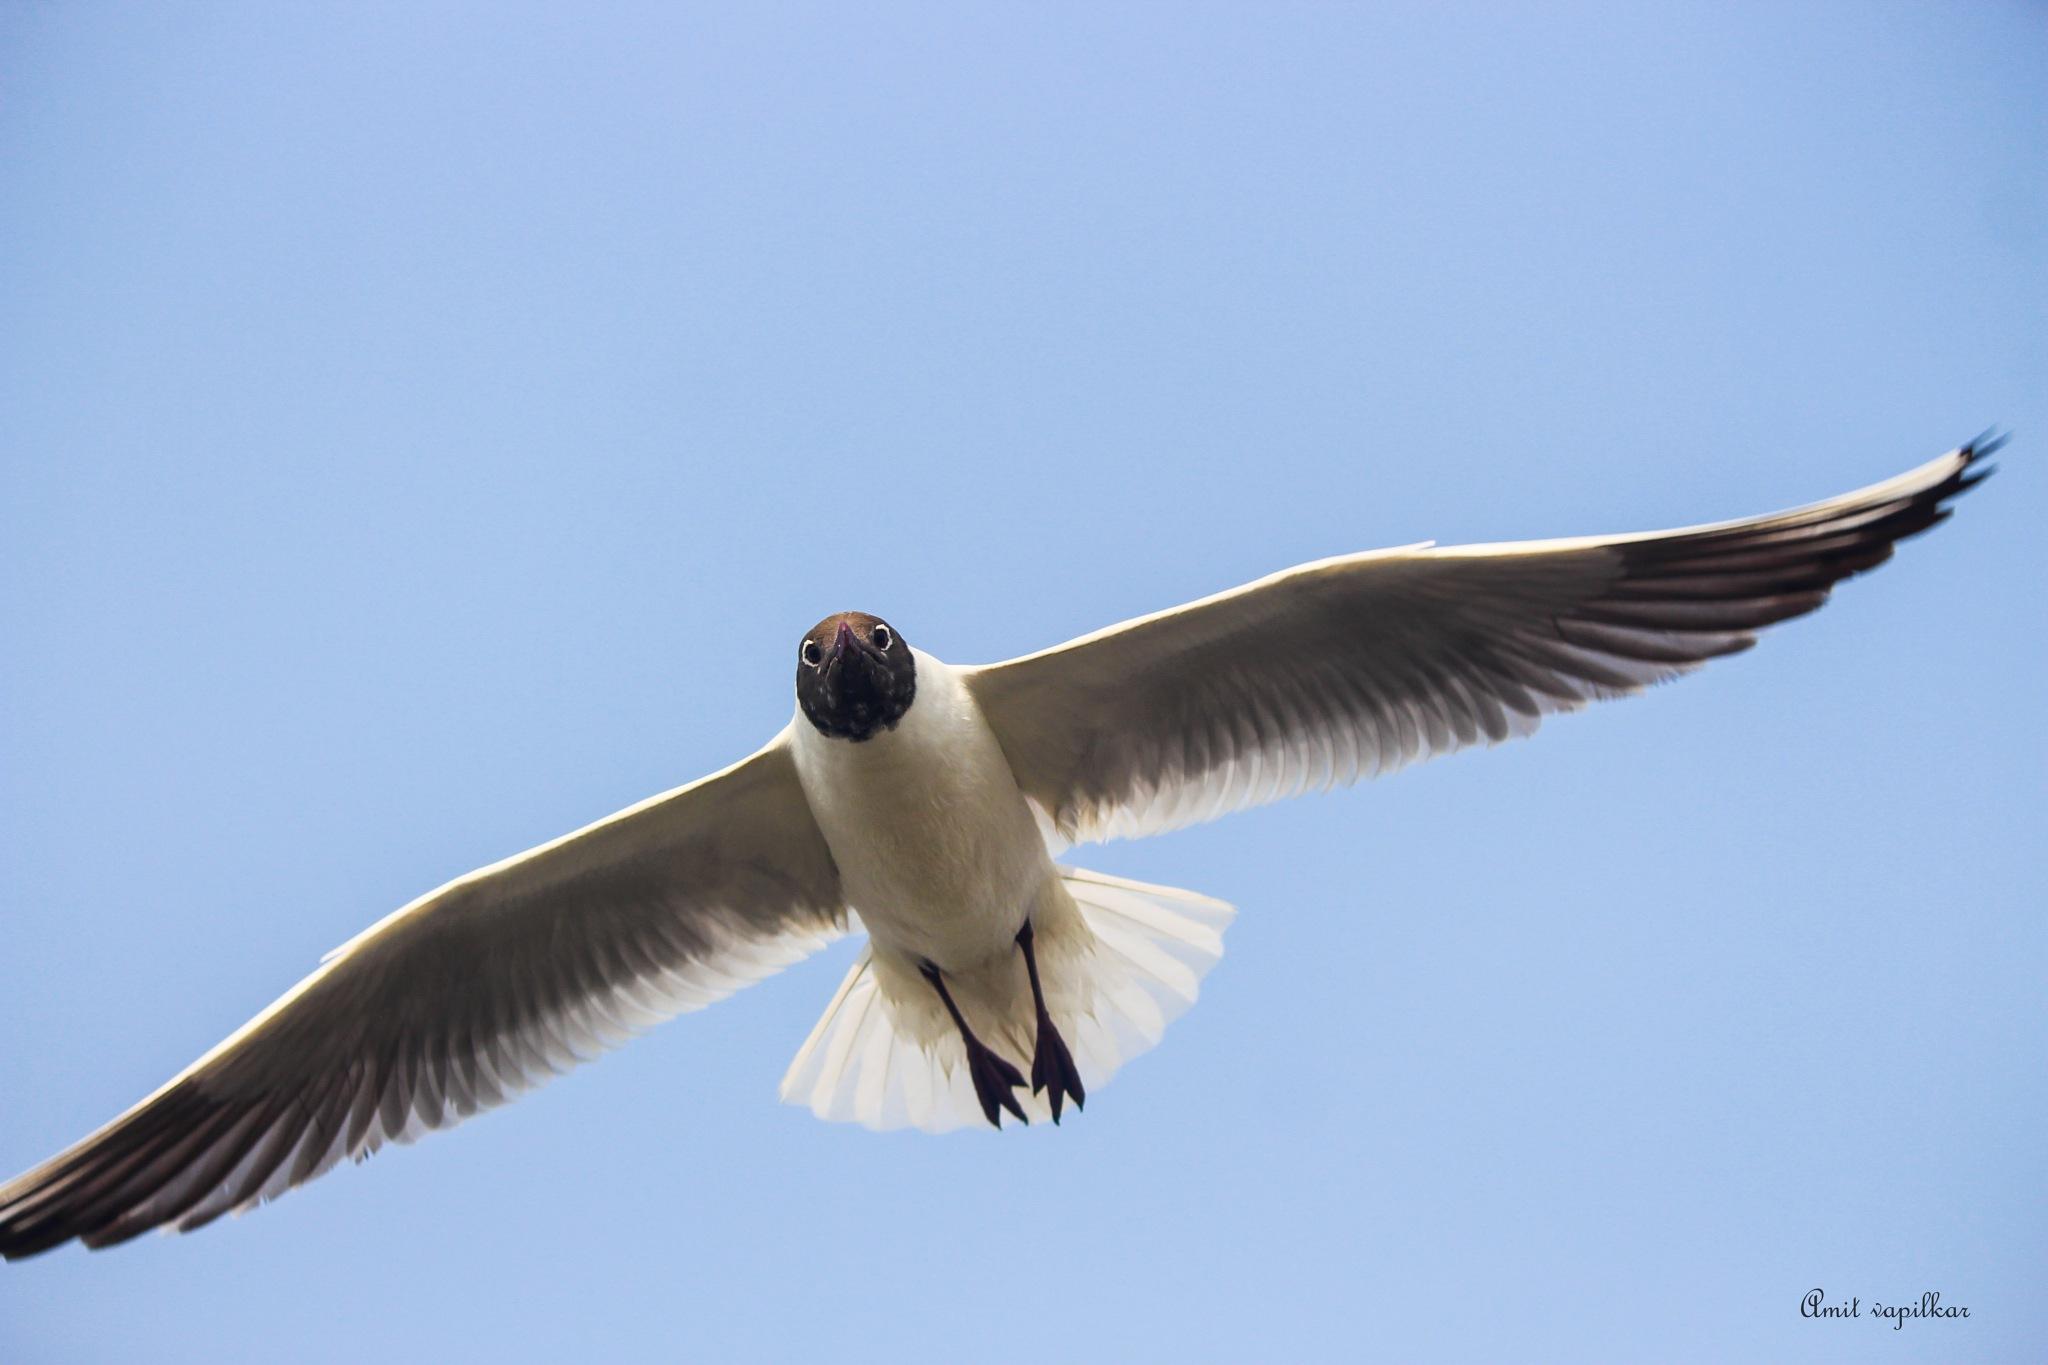 Seagull Flight by Amit vapilkar